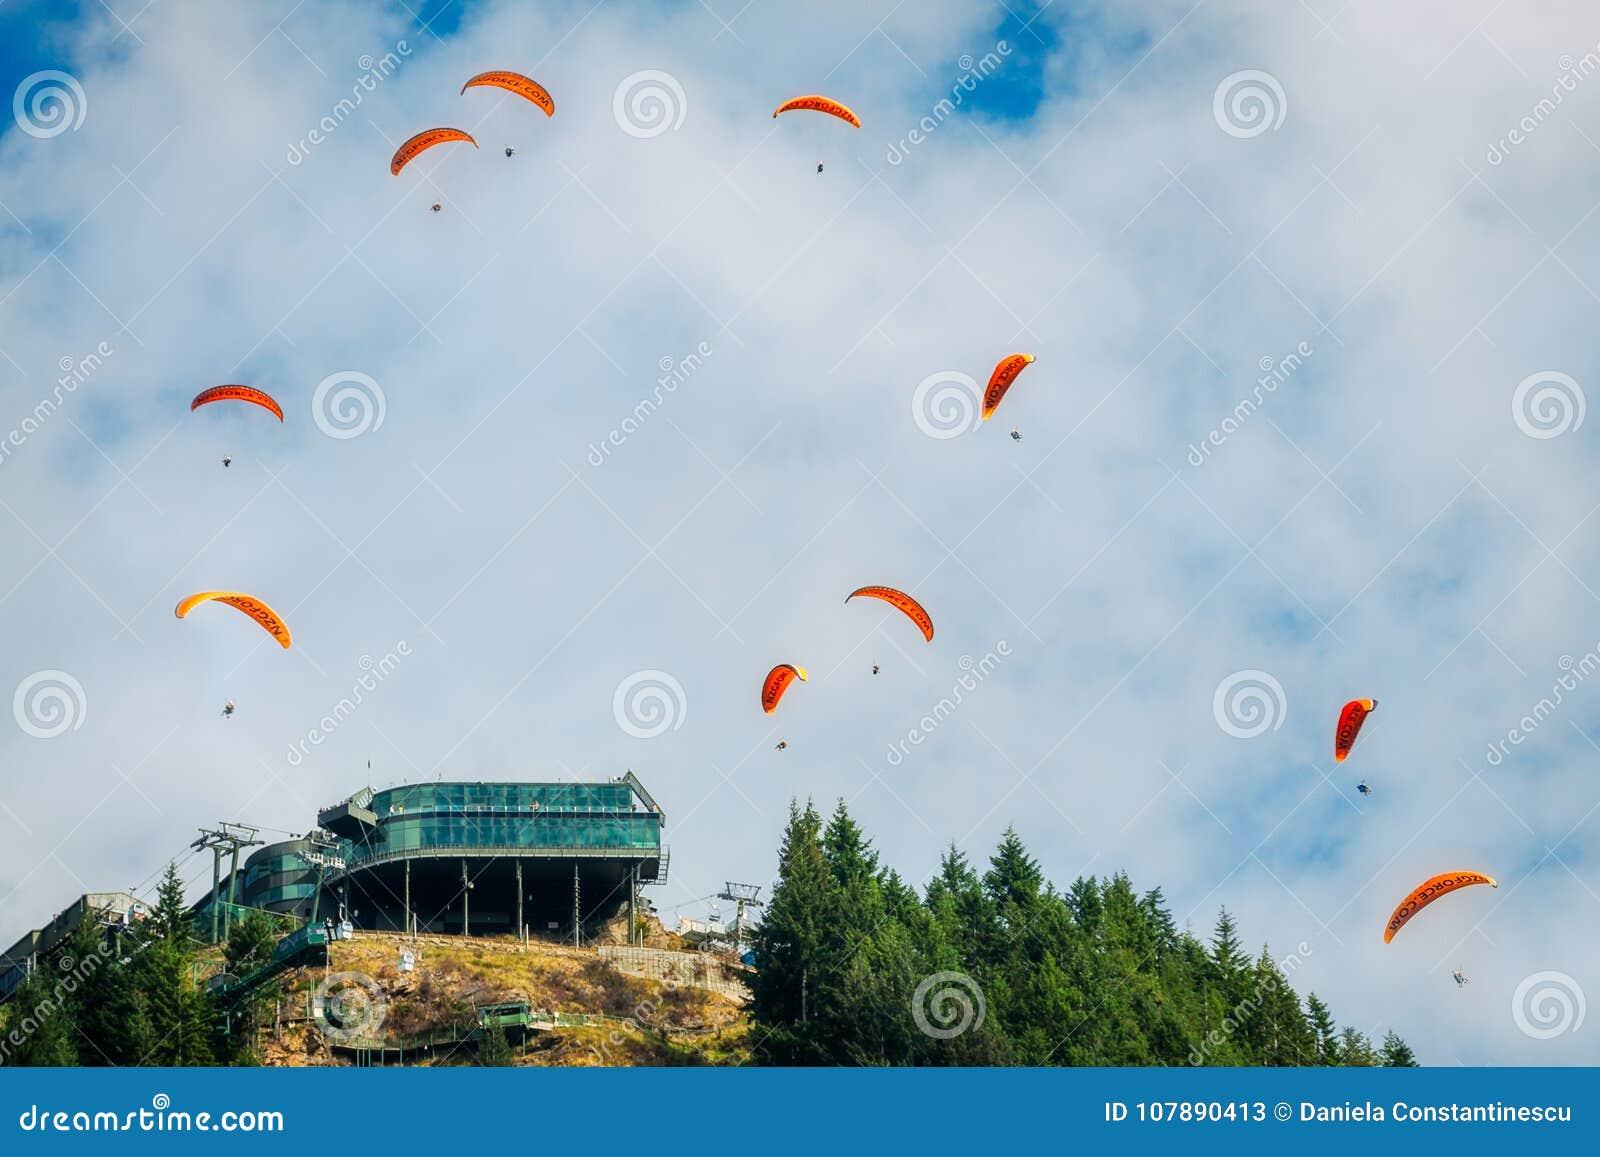 Paragliding at Queenstown Skyline, New Zealand